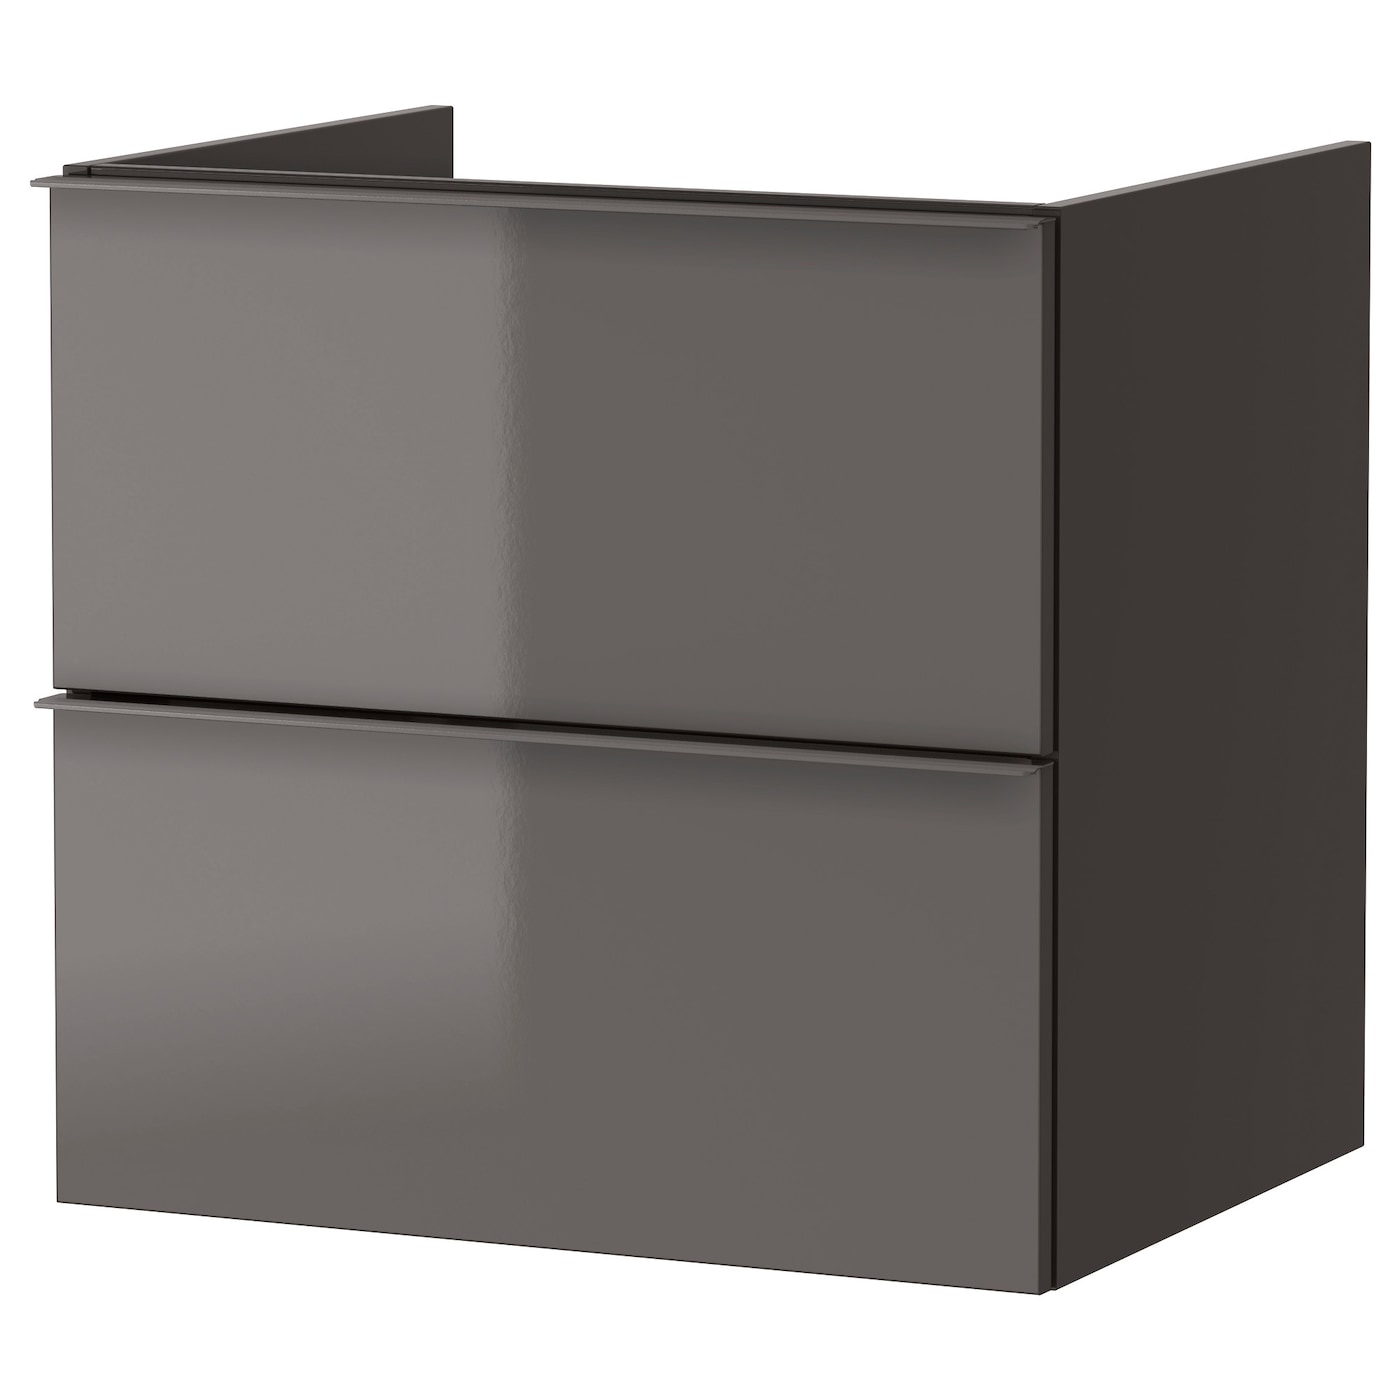 Godmorgon meuble lavabo 2tir brillant gris 60x47x58 cm ikea for Ikea meuble lavabo